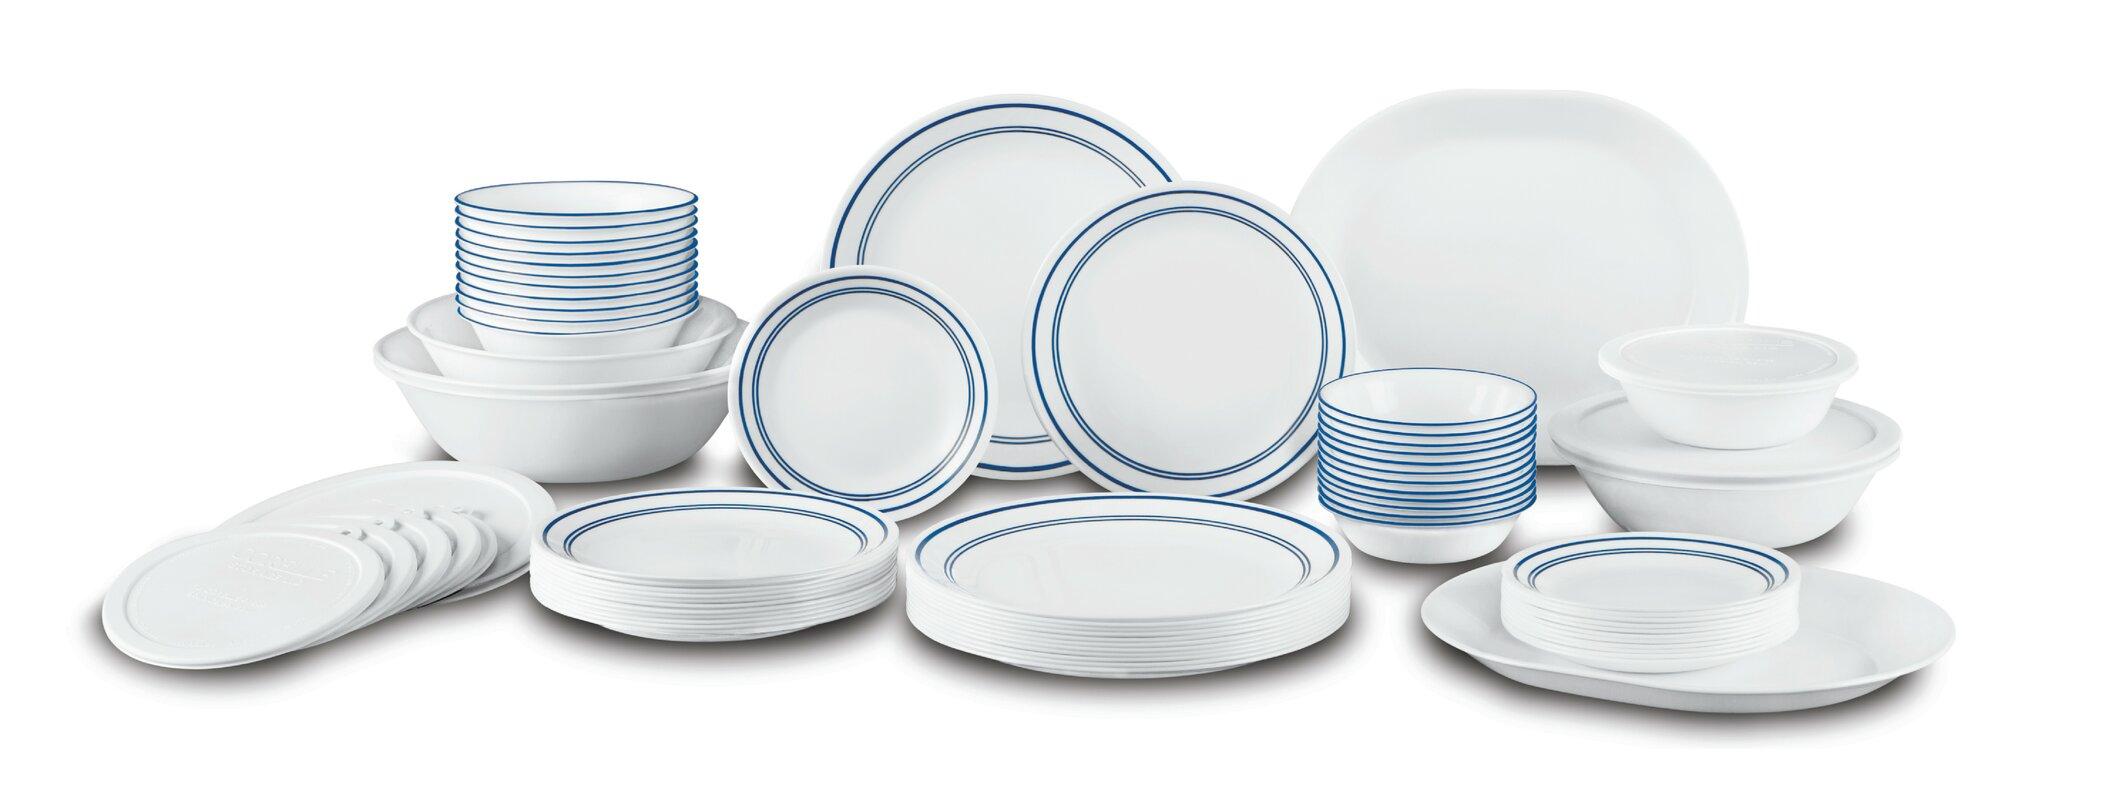 Classic Cafe Living Ware 74 Piece Dinnerware Set Service for 12  sc 1 st  Wayfair & Corelle Classic Cafe Living Ware 74 Piece Dinnerware Set Service ...